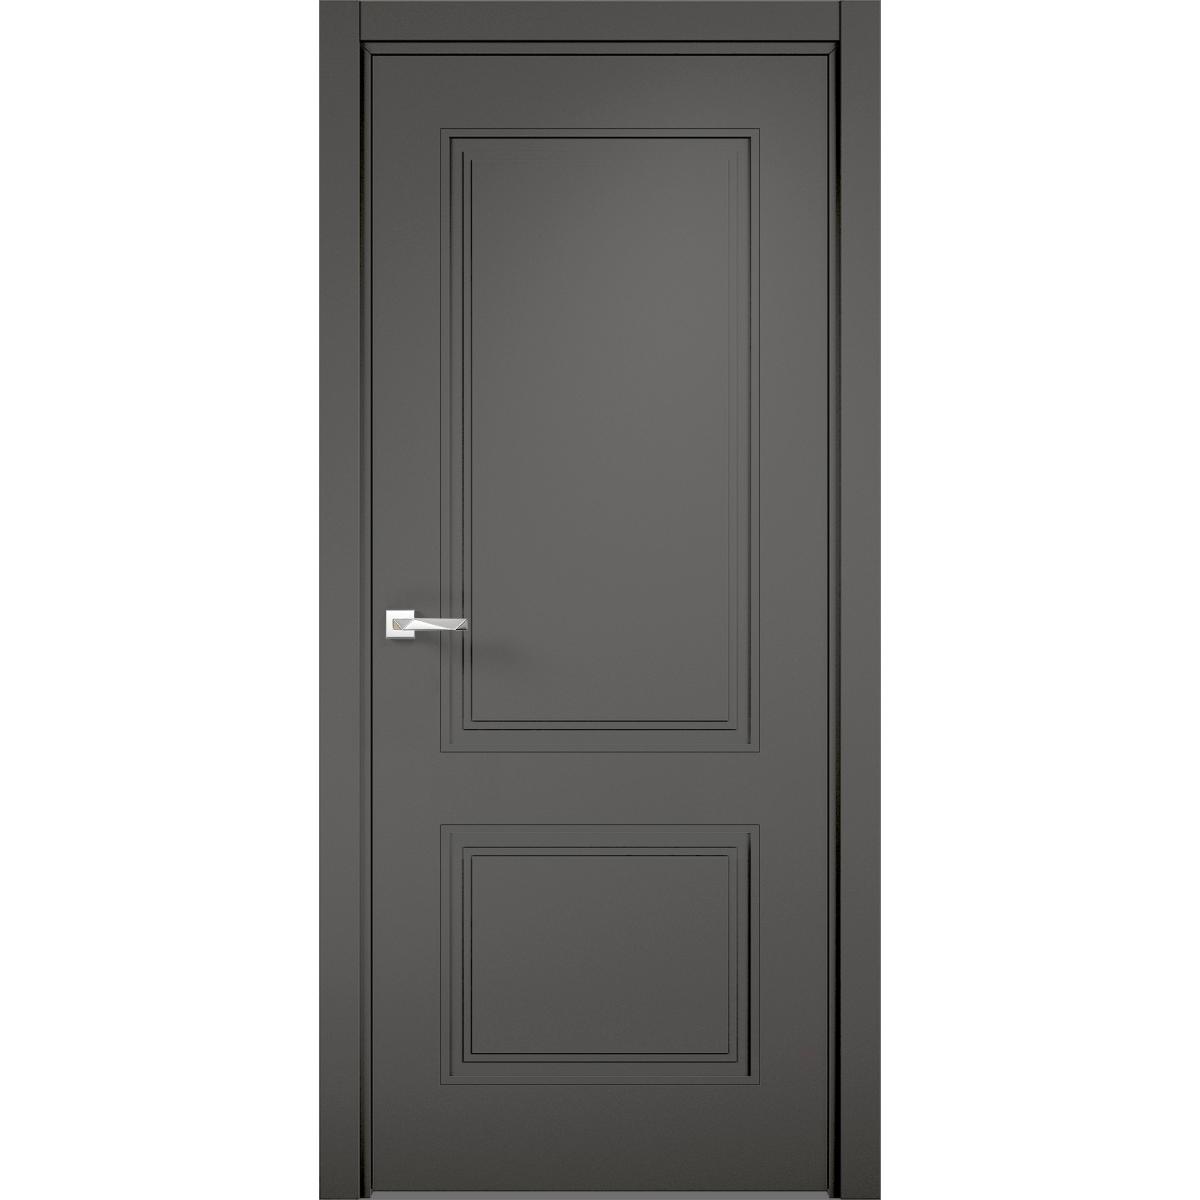 Дверное полотно Loyard Ларедо МП_0330 2000х800х44 мм МДФ